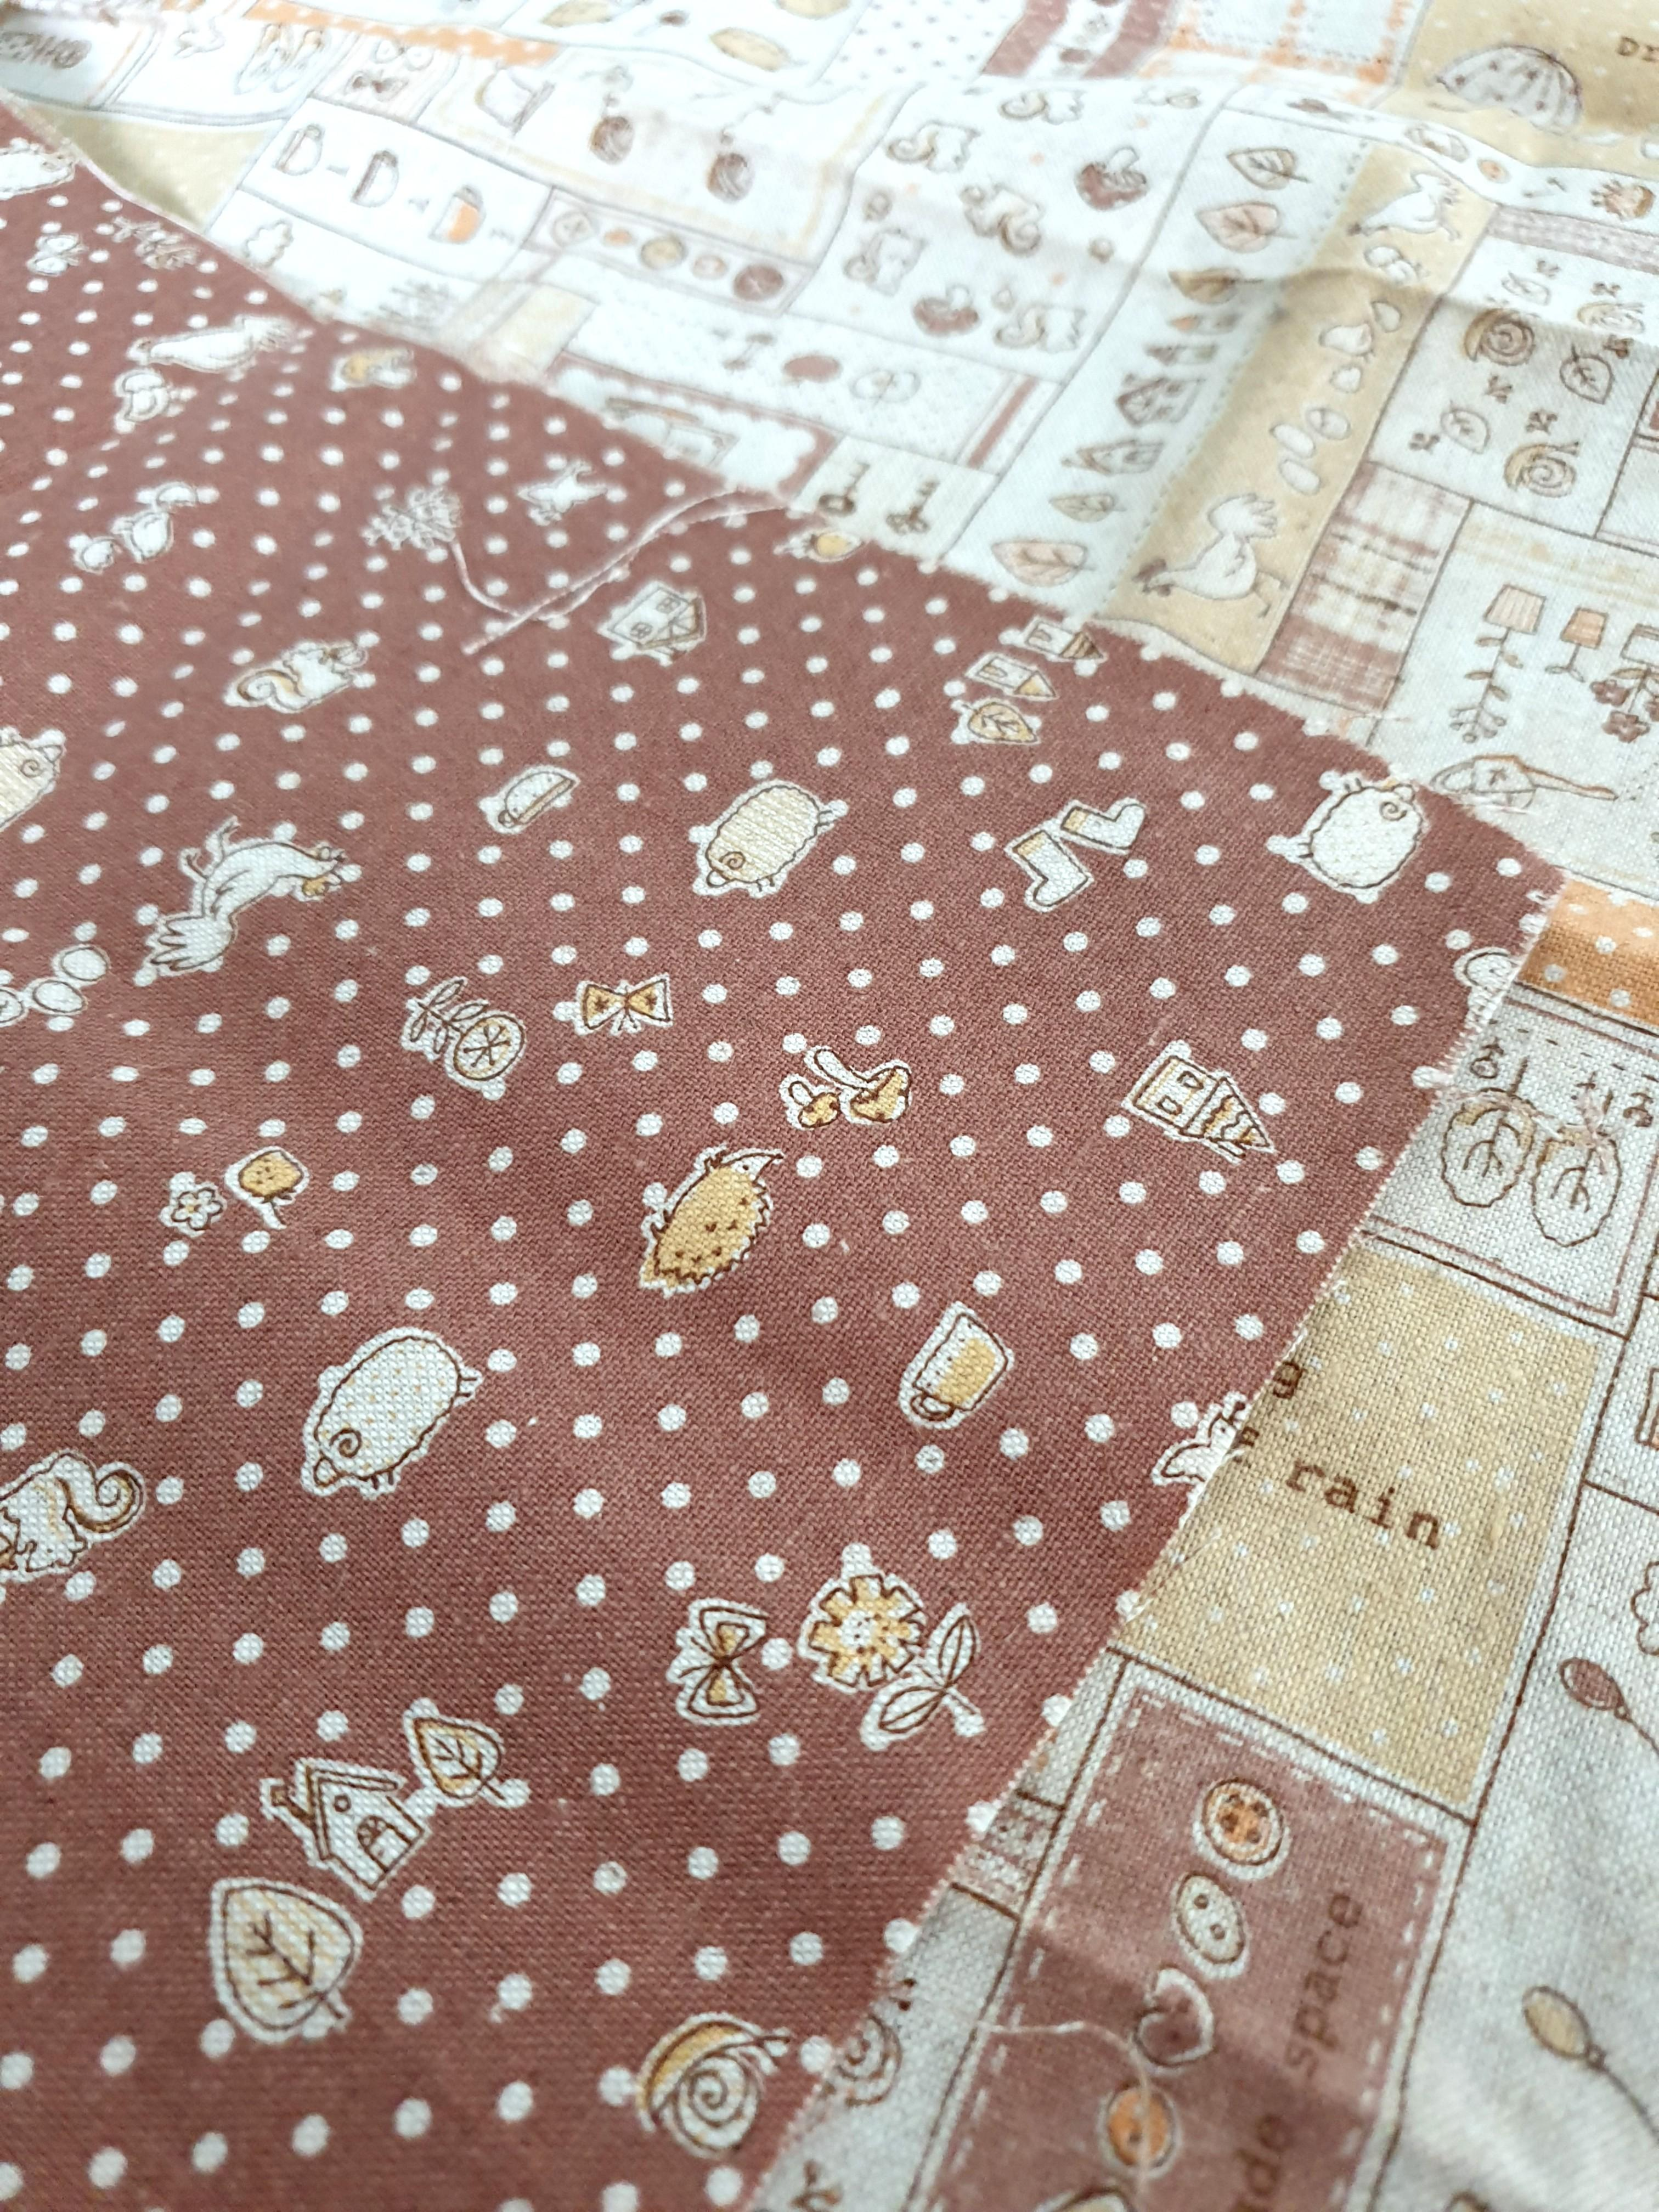 Everyday life double-sided print fabric (55 x 53cm) DESTASH